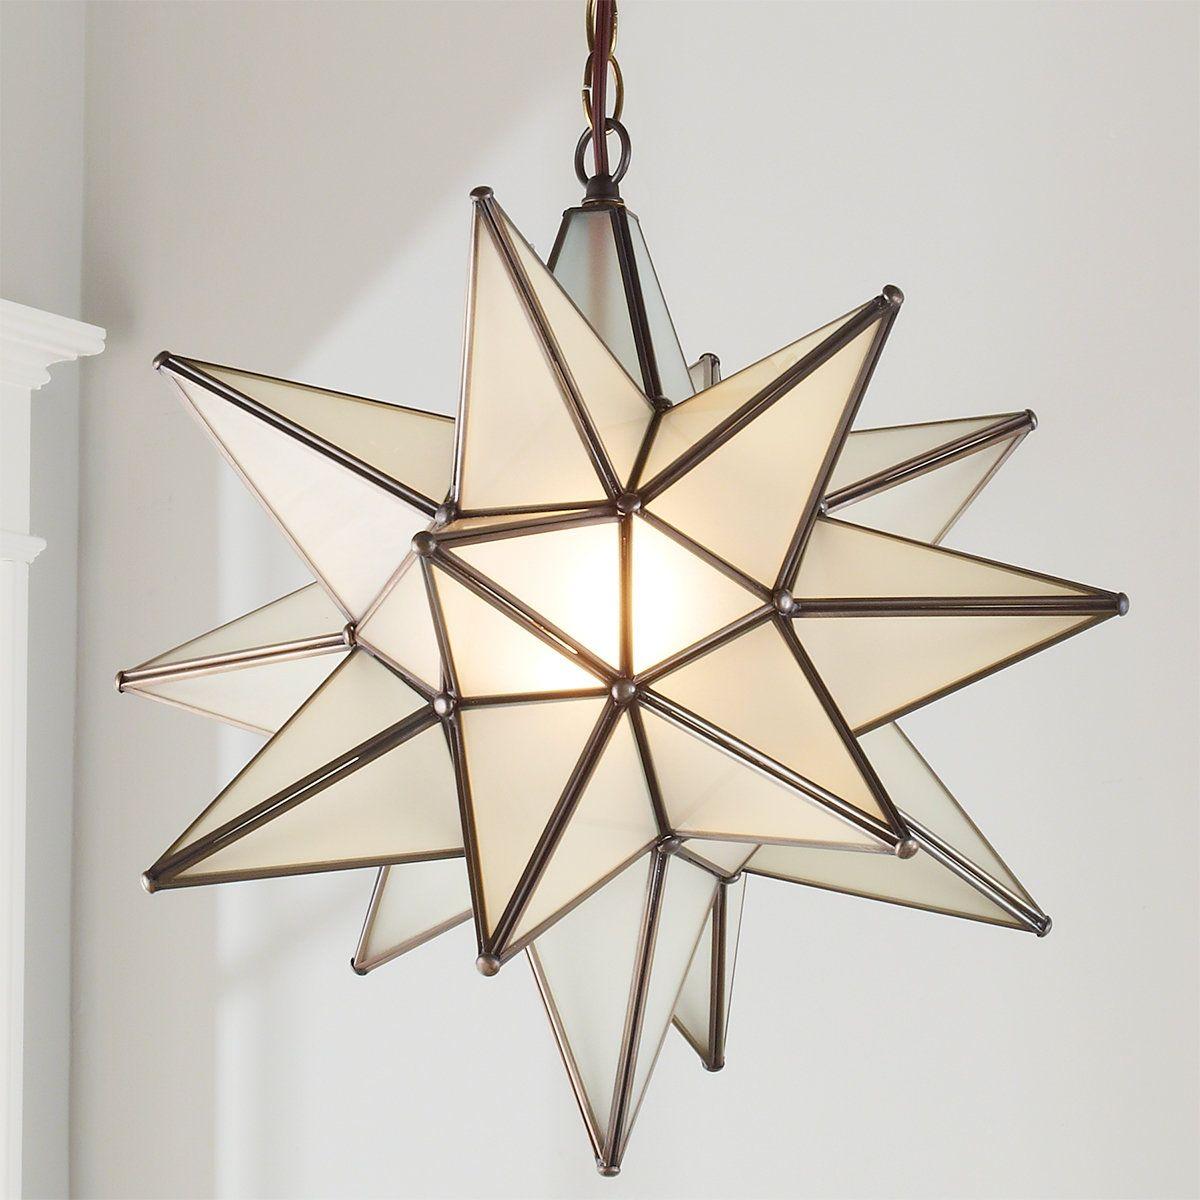 Superior Moravian Star Light In 2021 Moravian Star Light Star Light Fixture Star Pendant Lighting